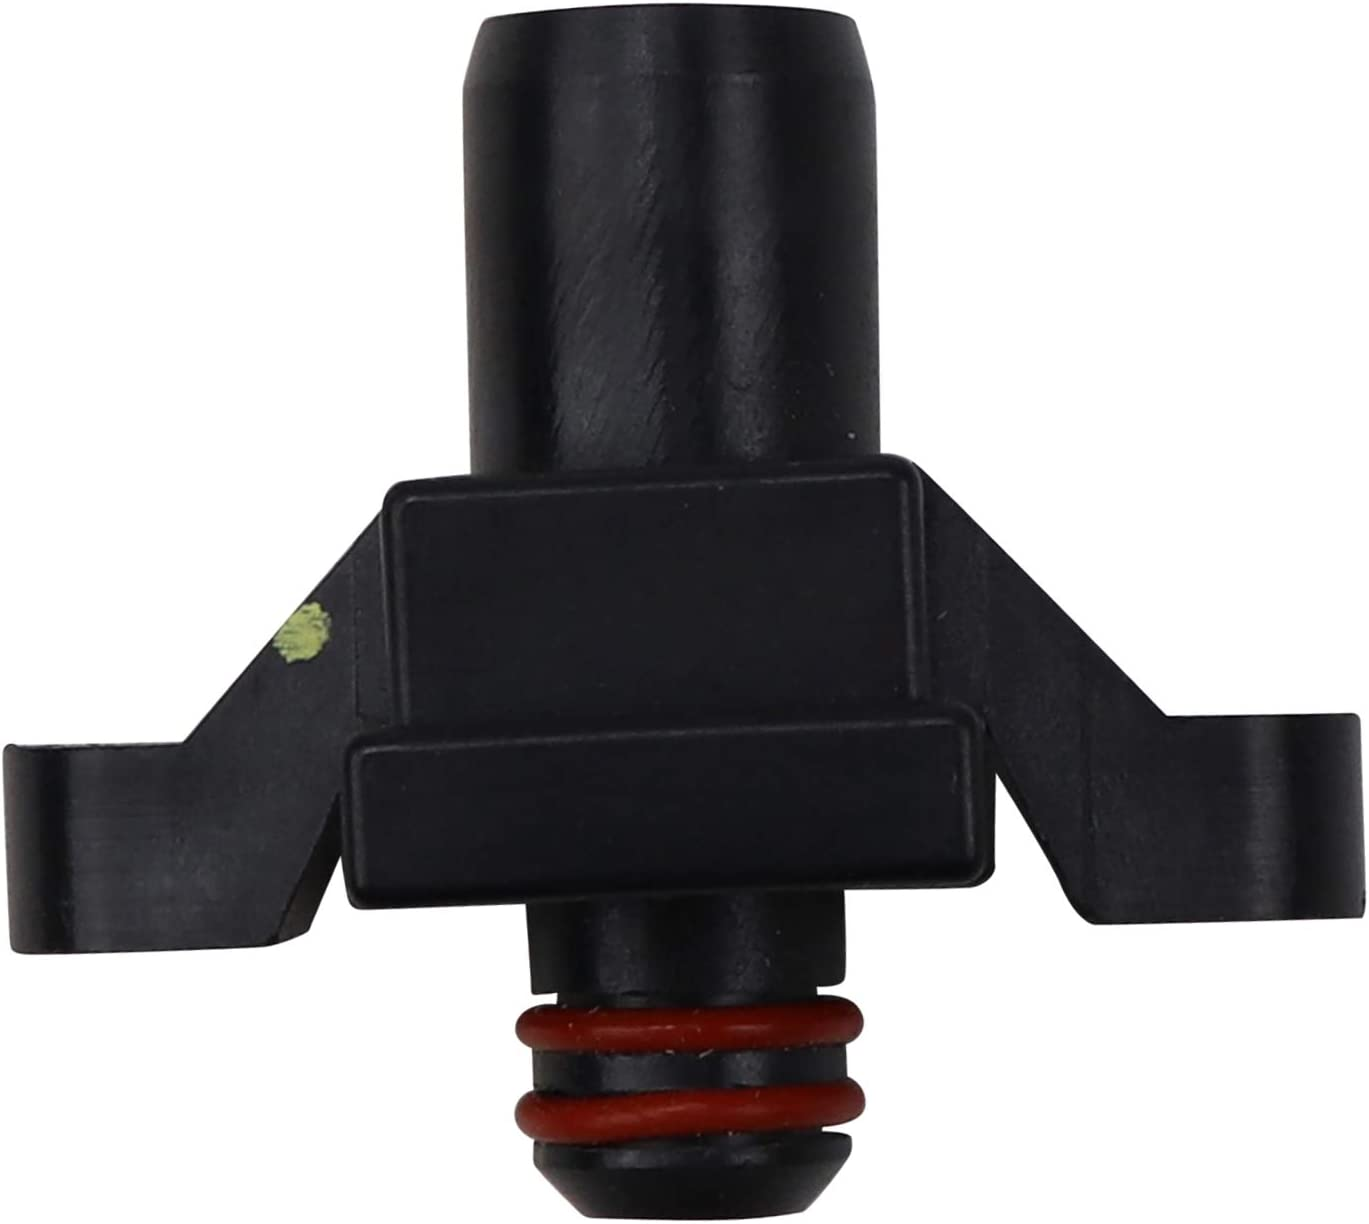 Beck Arnley 158-0749 正規品送料無料 販売実績No.1 Fuel Manifold Sensor Pressure Injection